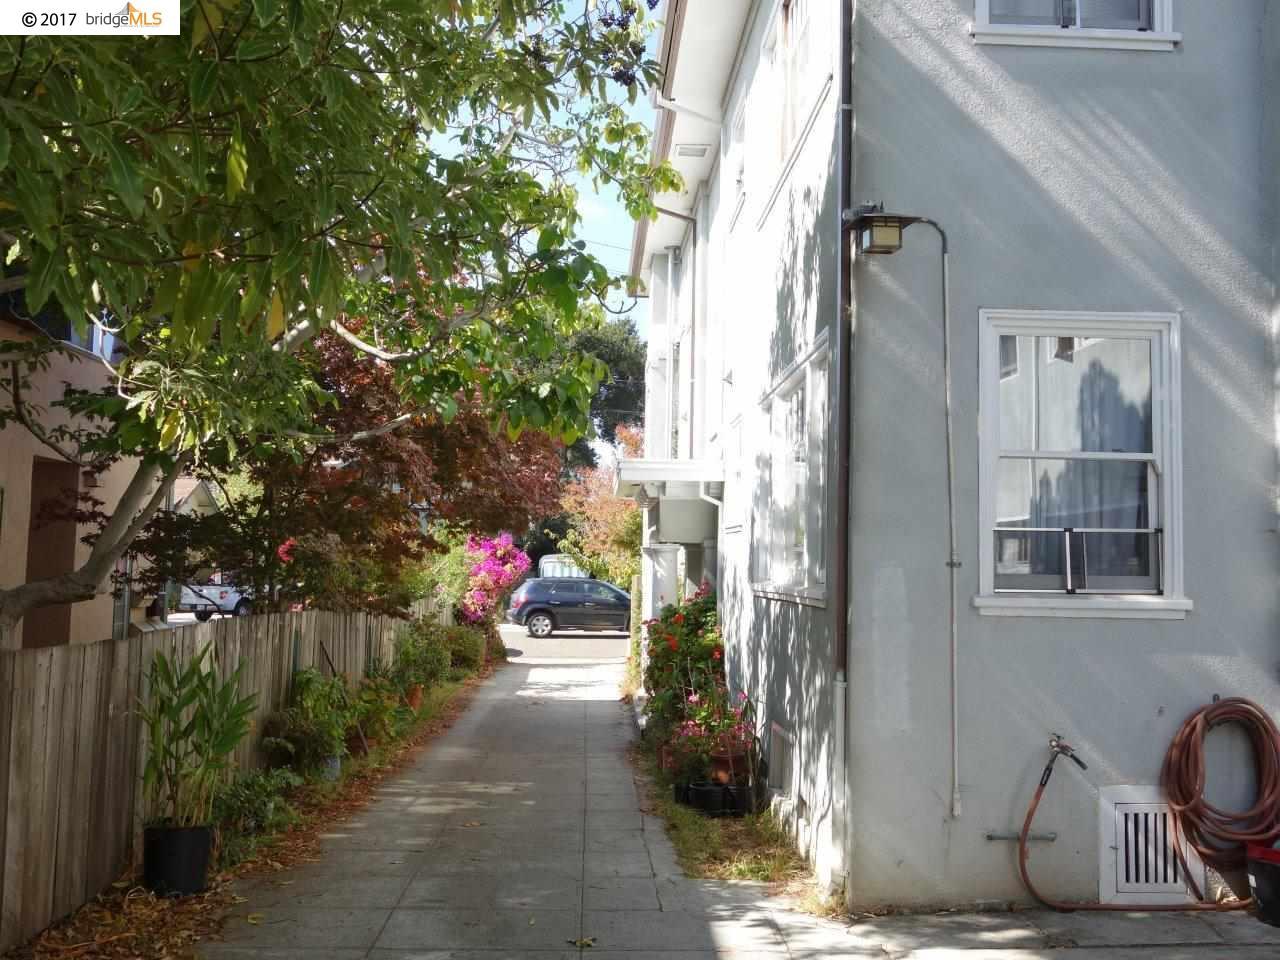 6426 BENVENUE AVENUE #3, OAKLAND, CA 94618  Photo 5